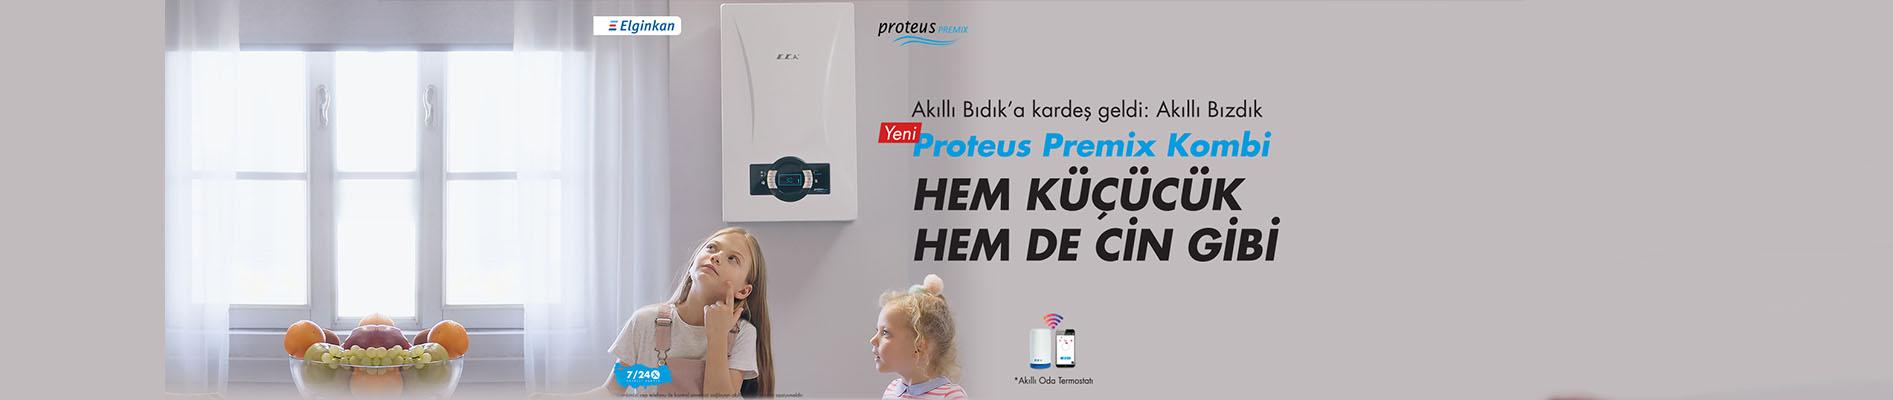 eca-kanaat-tesisat-proteus